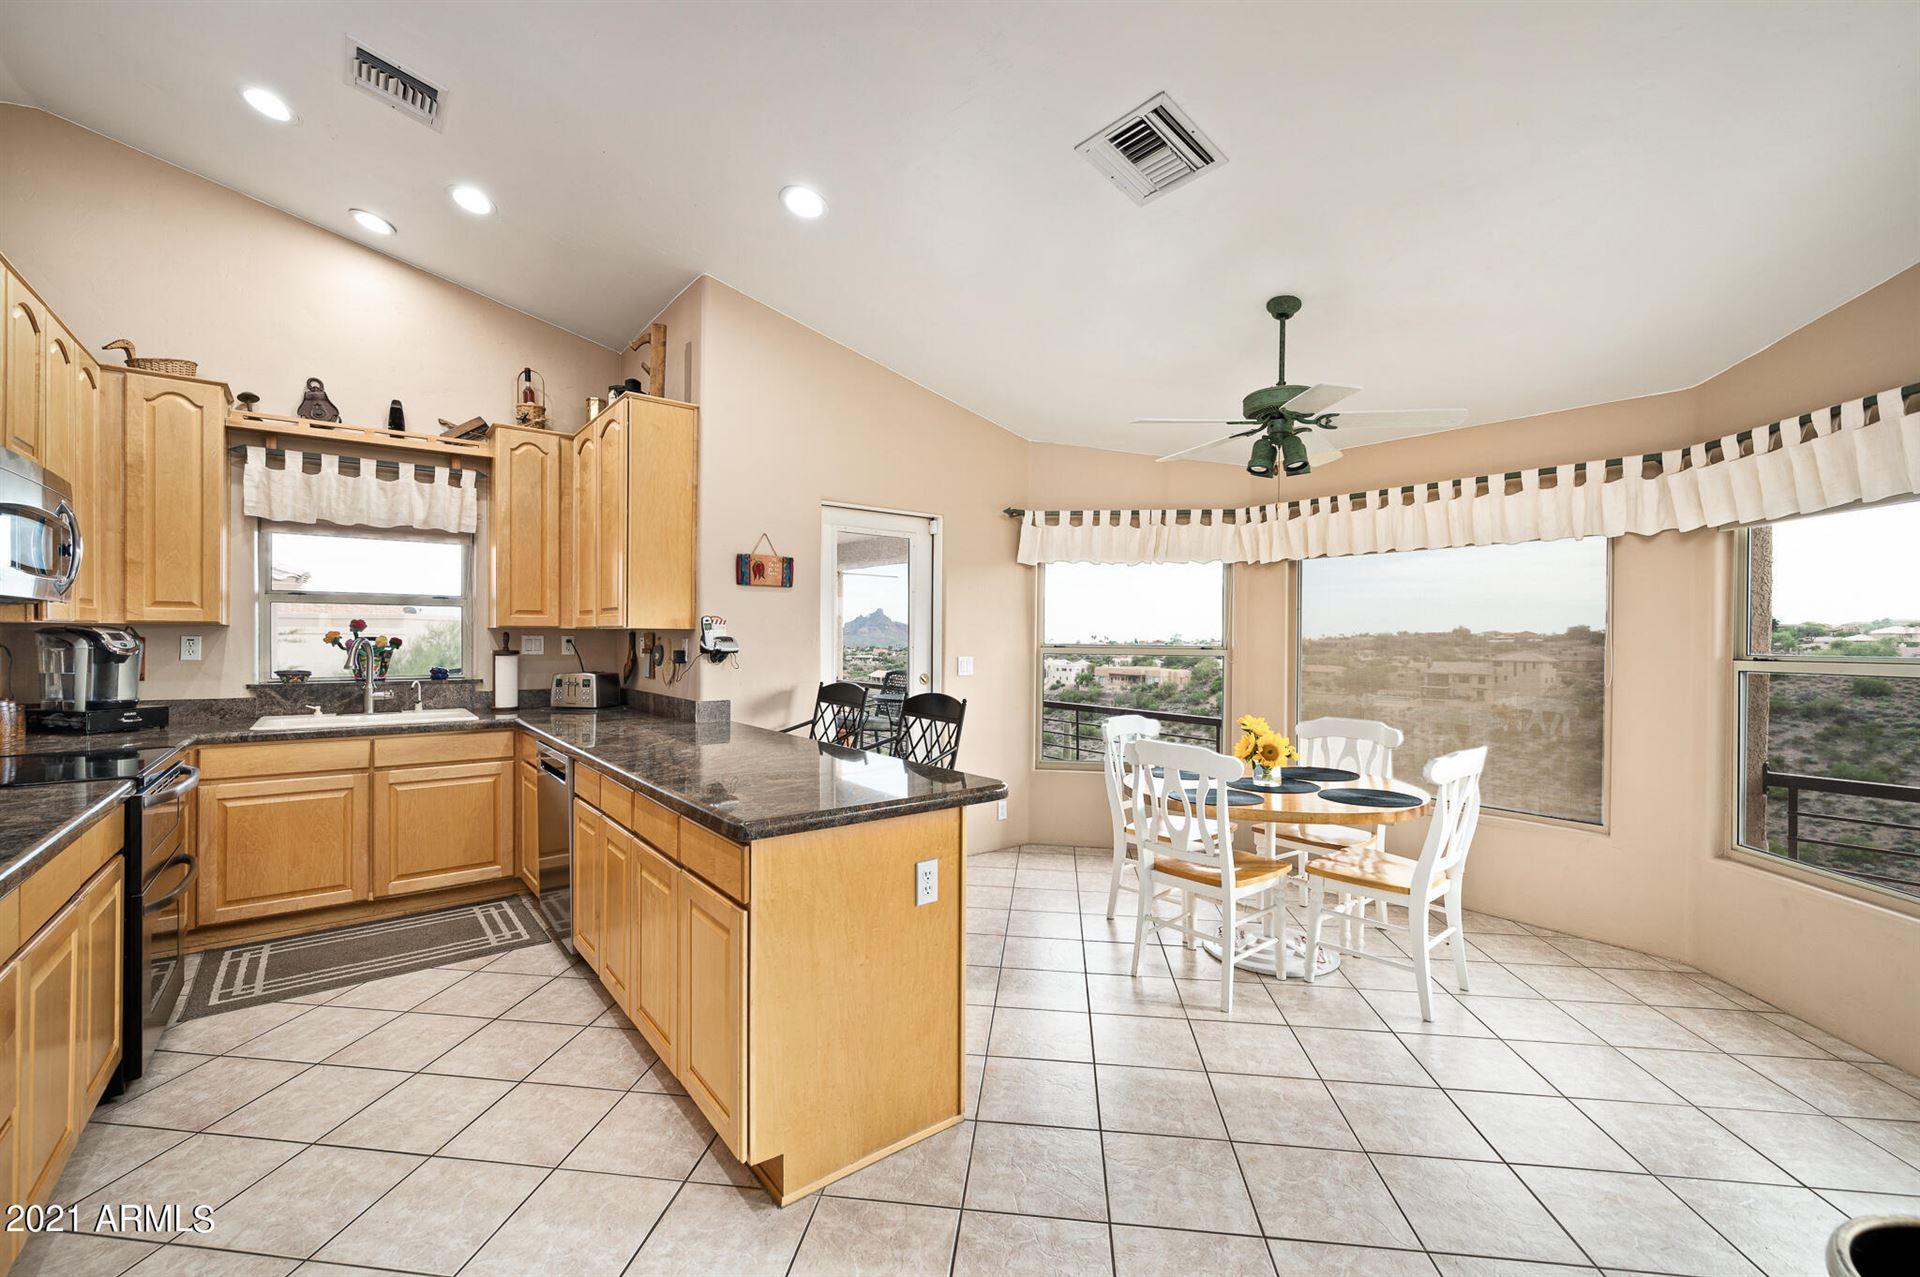 Photo of 15731 E SYCAMORE Drive, Fountain Hills, AZ 85268 (MLS # 6306699)